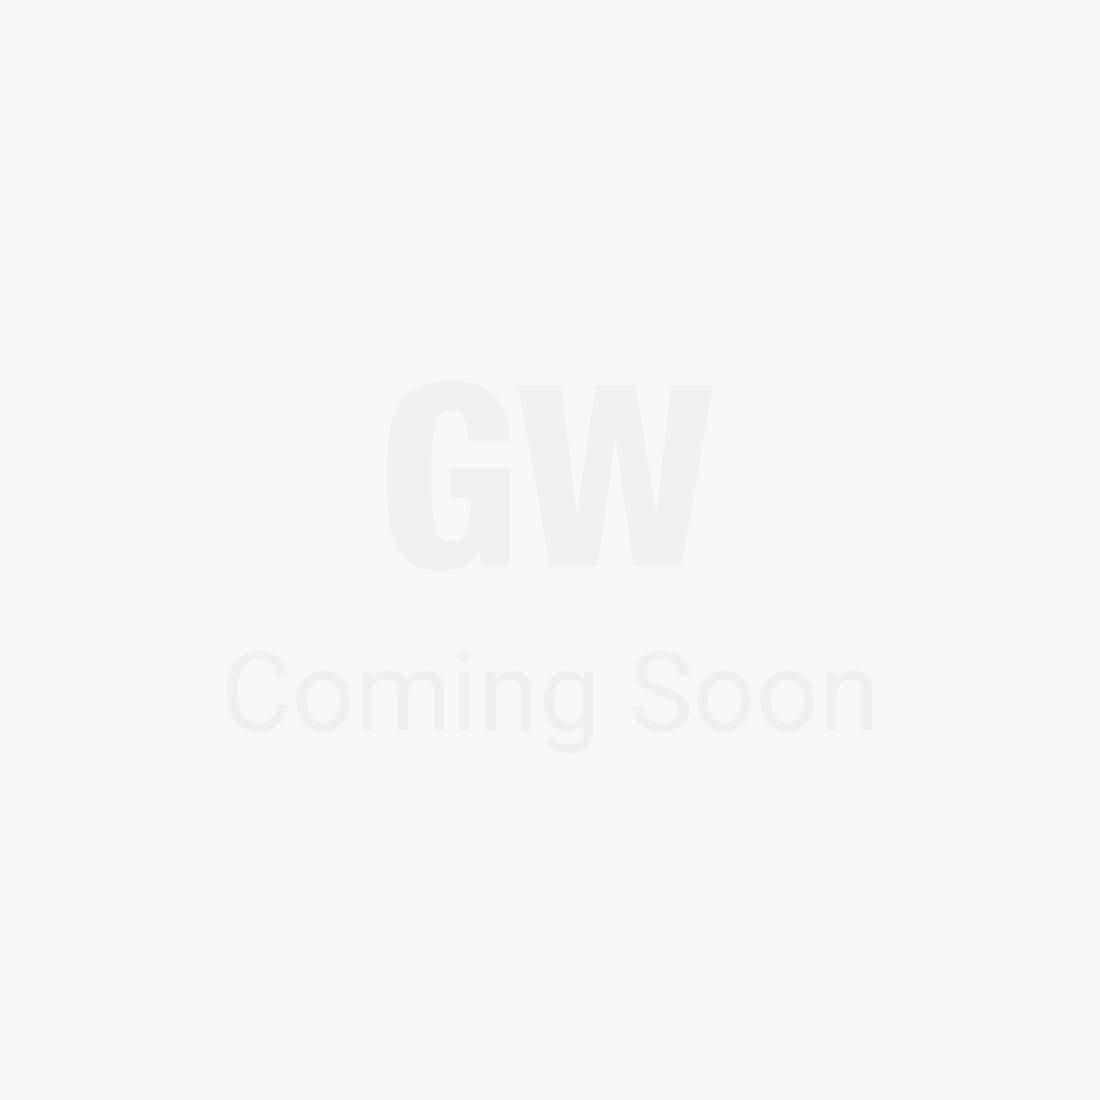 Smith Sleigh Dining Chair